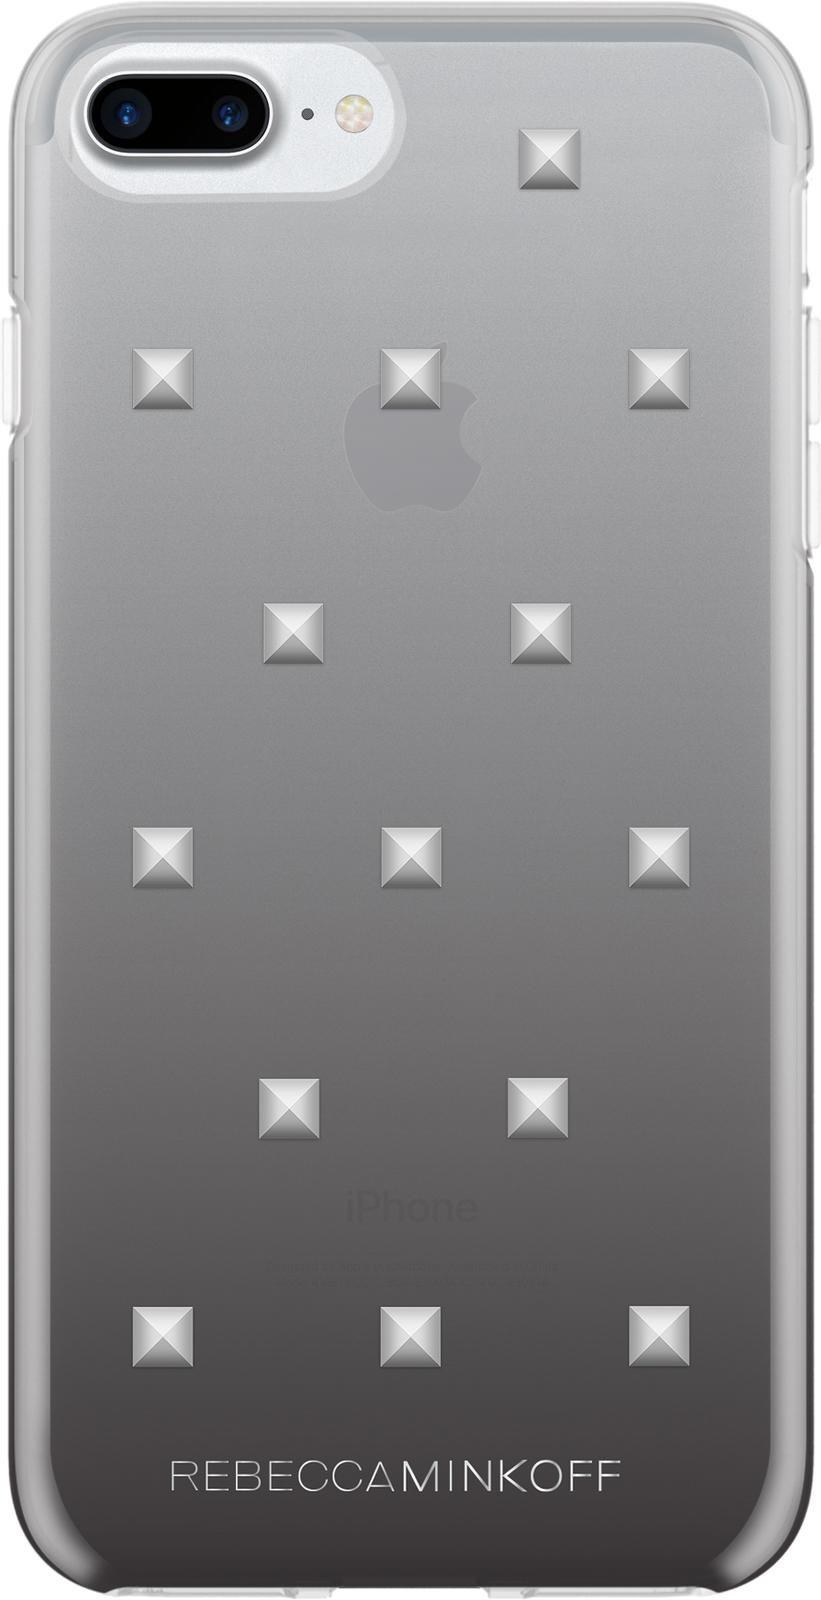 Incipio Rebecca Minkoff Hey, Stud Case IPhone 8/7 Plus Gunmetal RMIPH-056-GPSBO - eet01